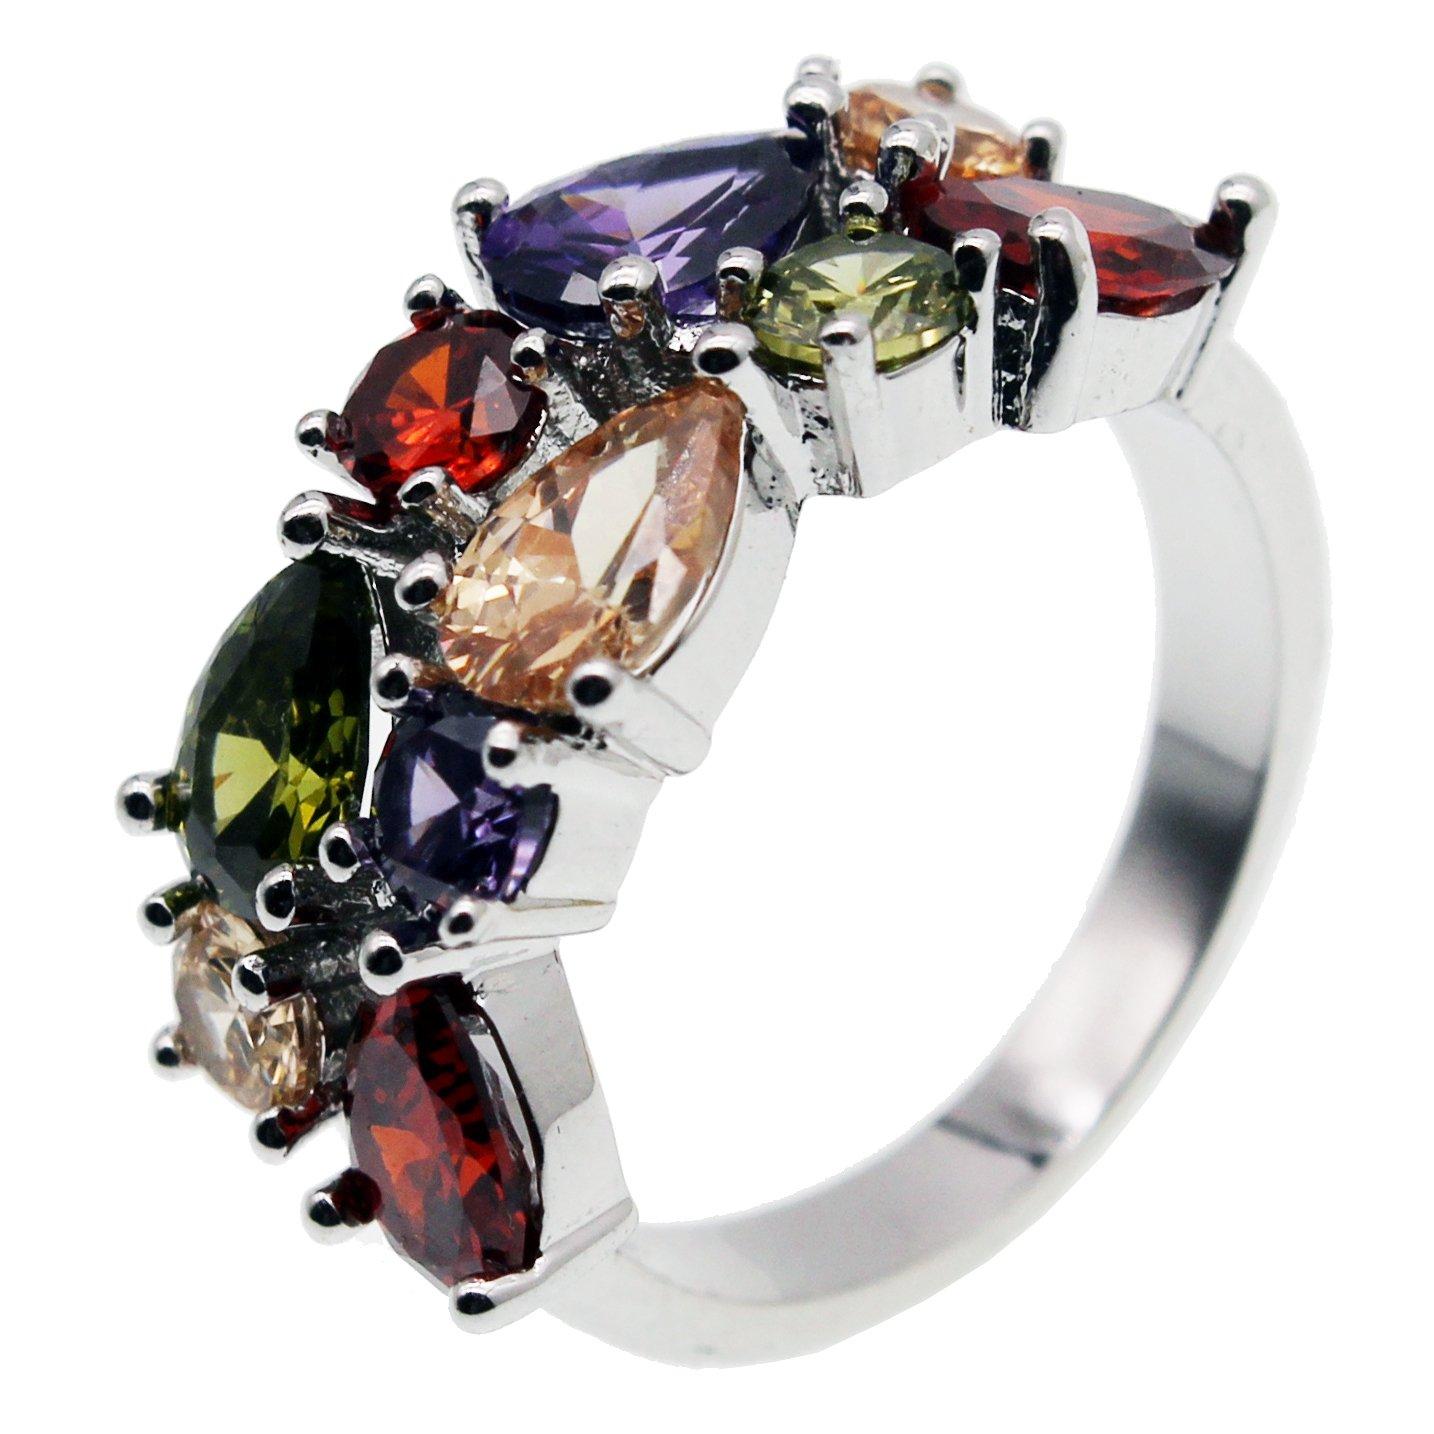 Multi Gemstone Ring Morganite Garnet Amethyst Peridot Promise Wedding Party Ring for Girls Women Size 6 to 10 (9)